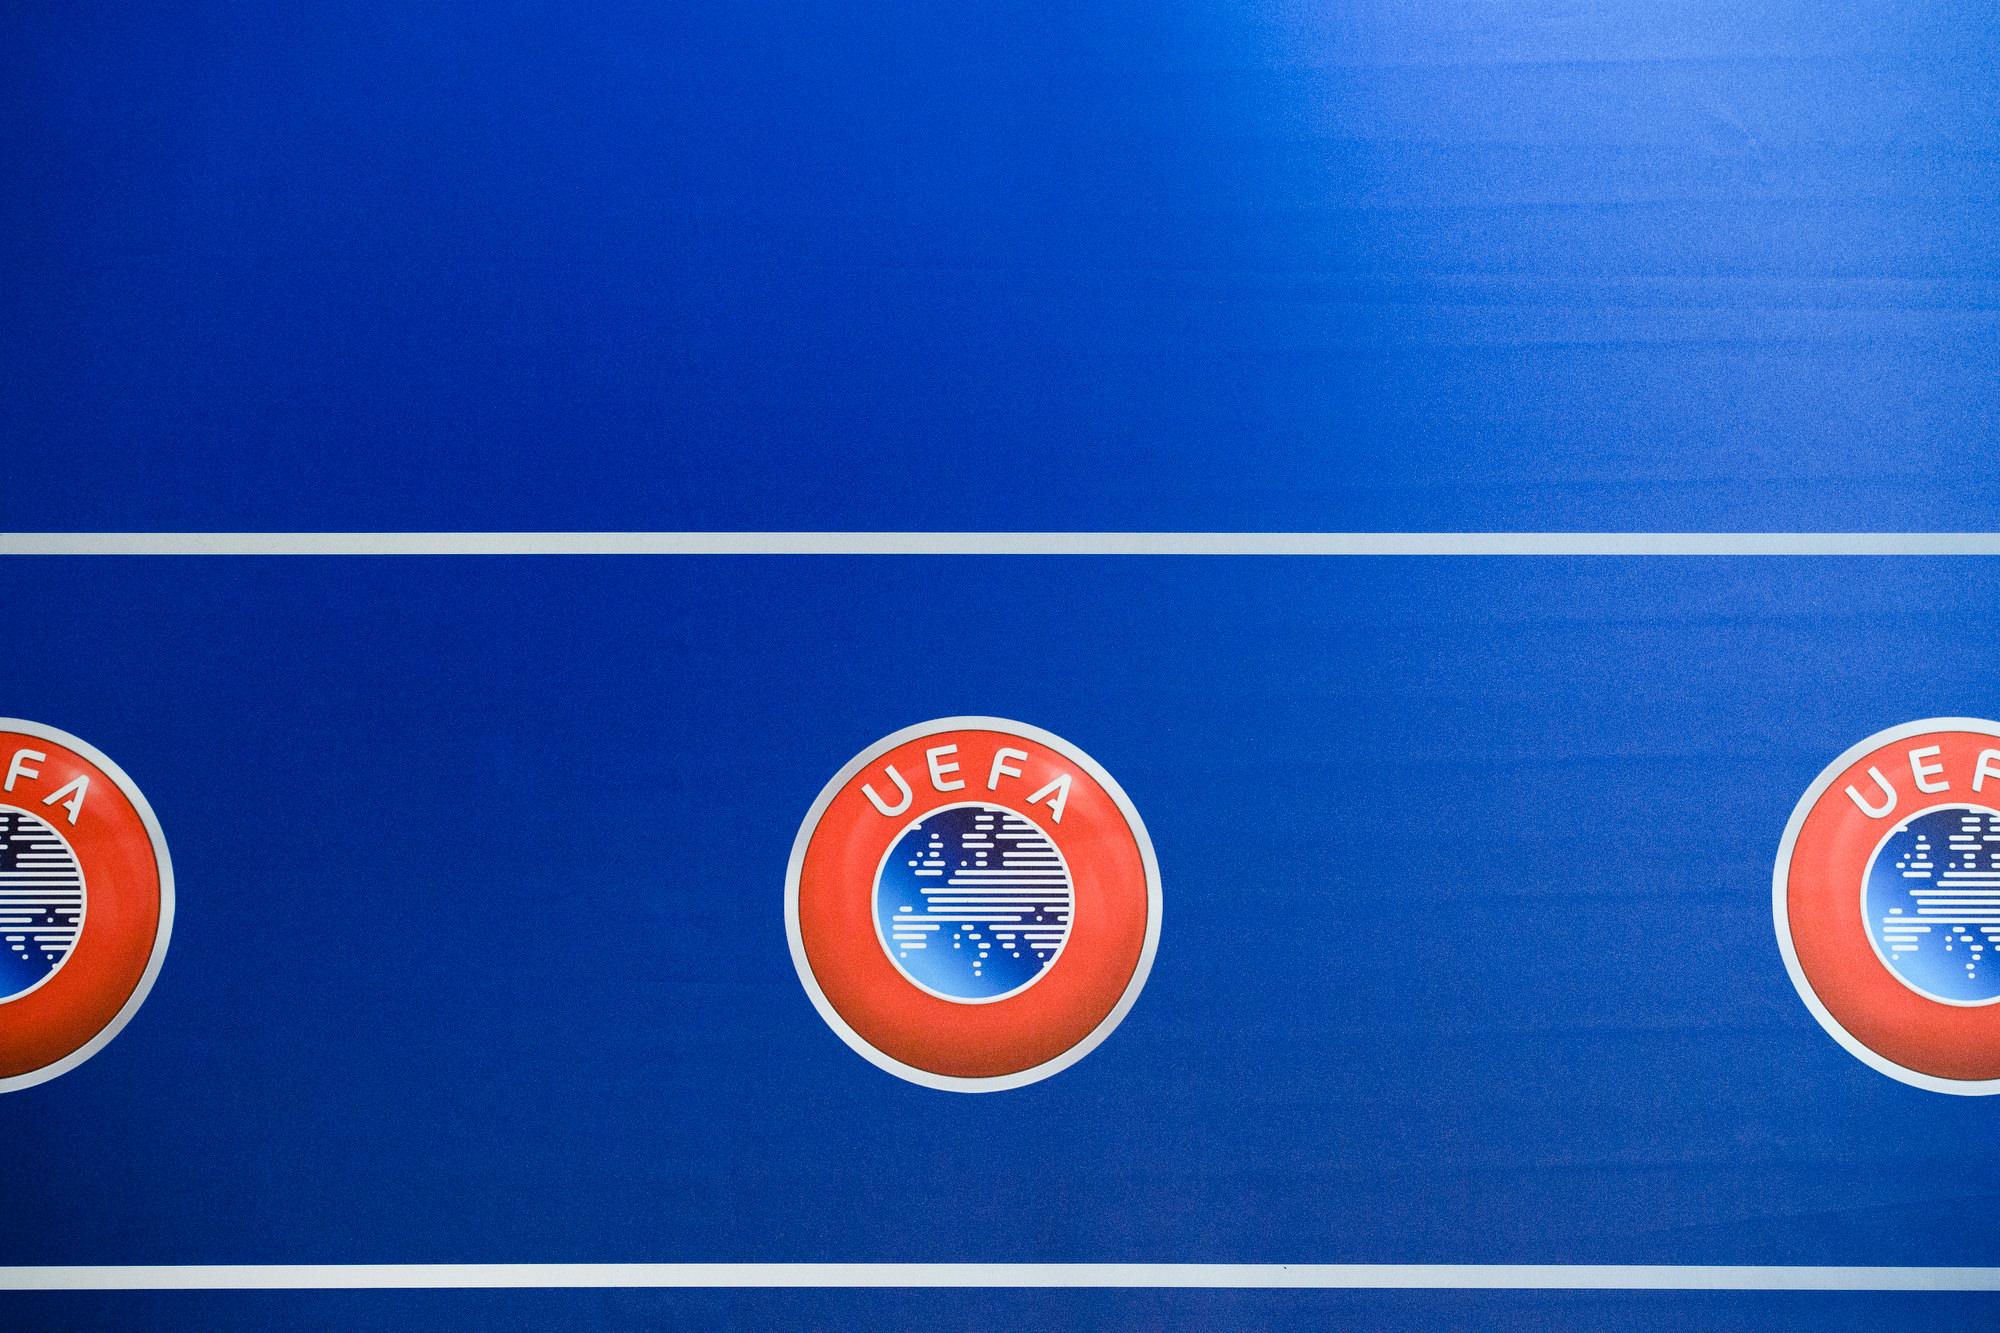 SWITZERLAND SOCCER FUSSBALL EUROPA LEAGUE 2016/17 DRAW